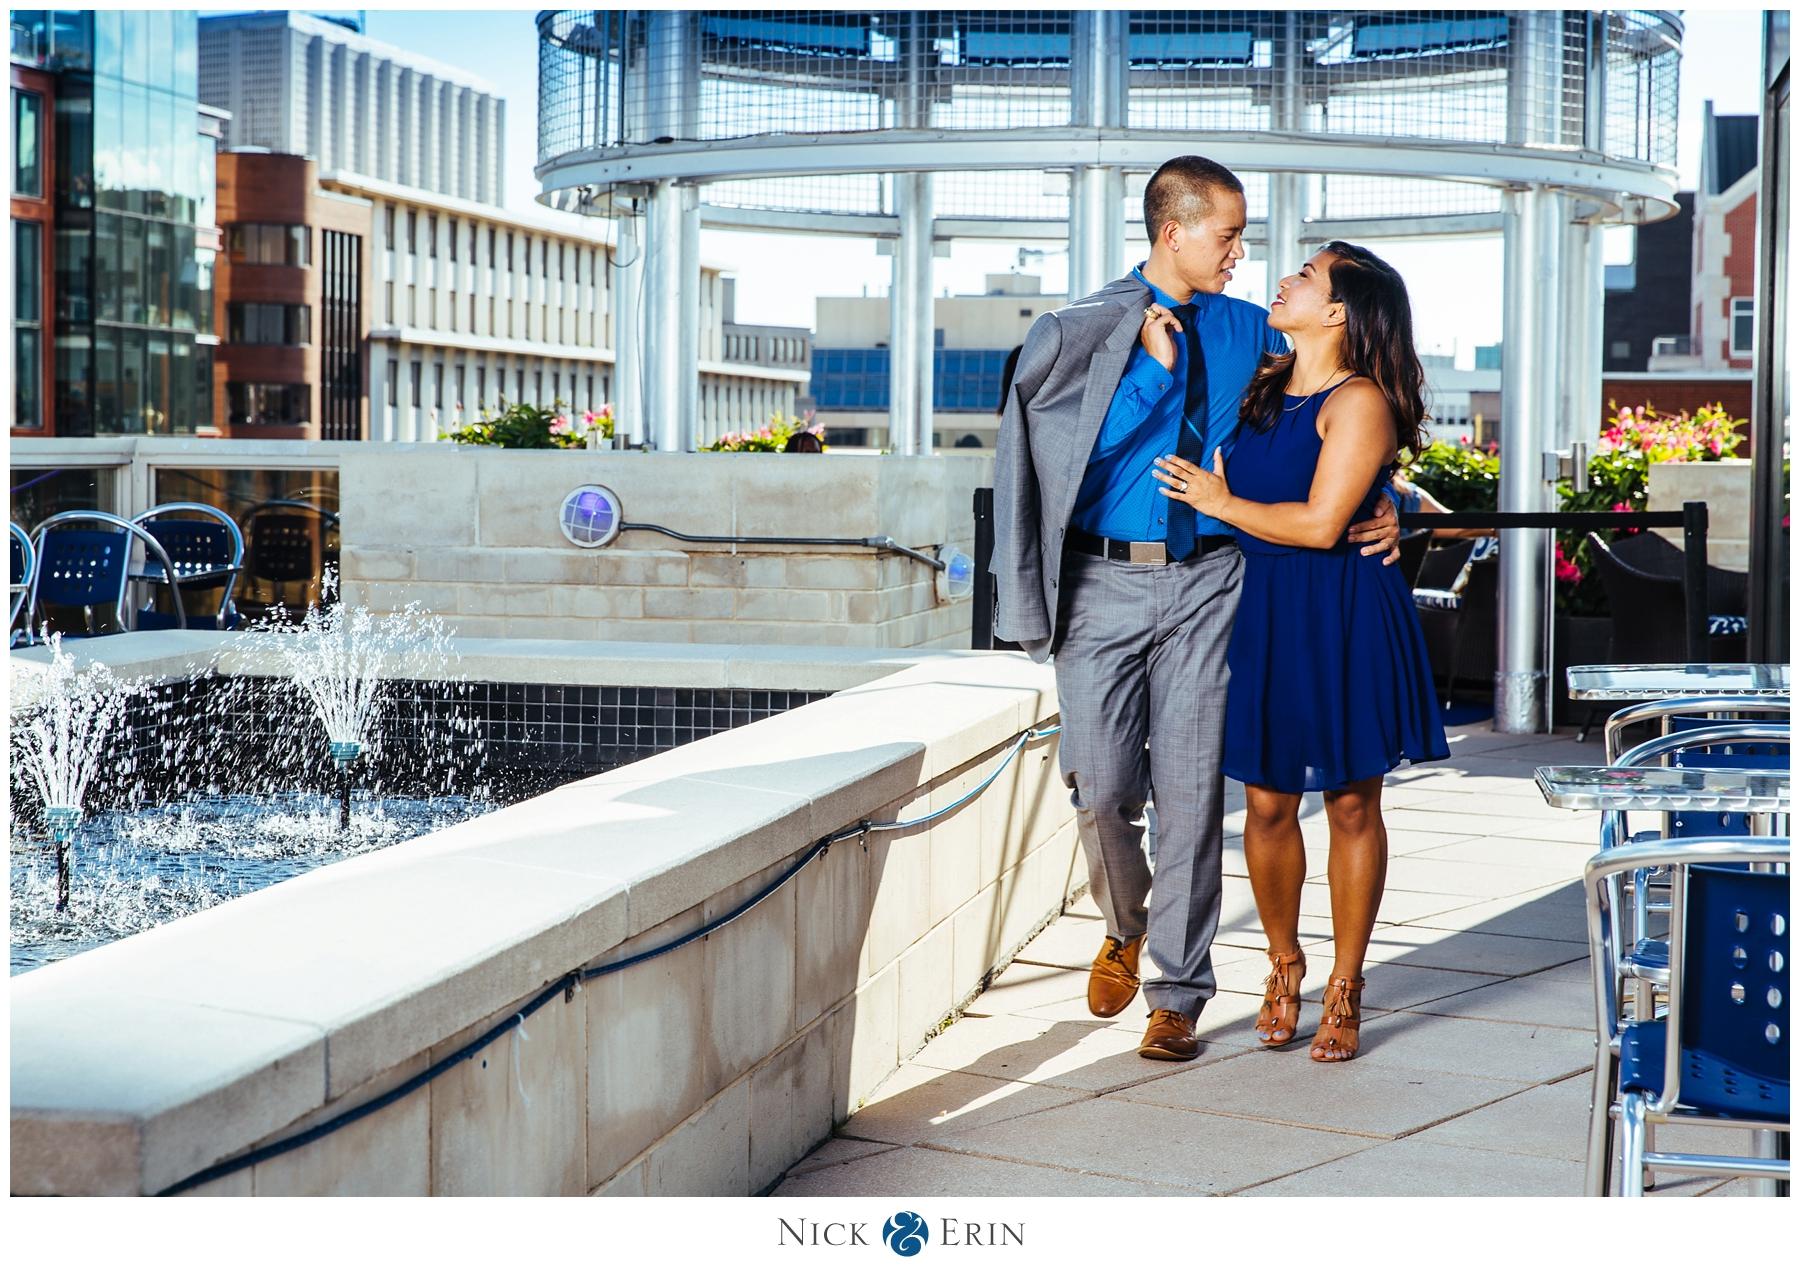 Donner_Photography_Washington DC Engagement Session_Jenny Mae & Vic_0010